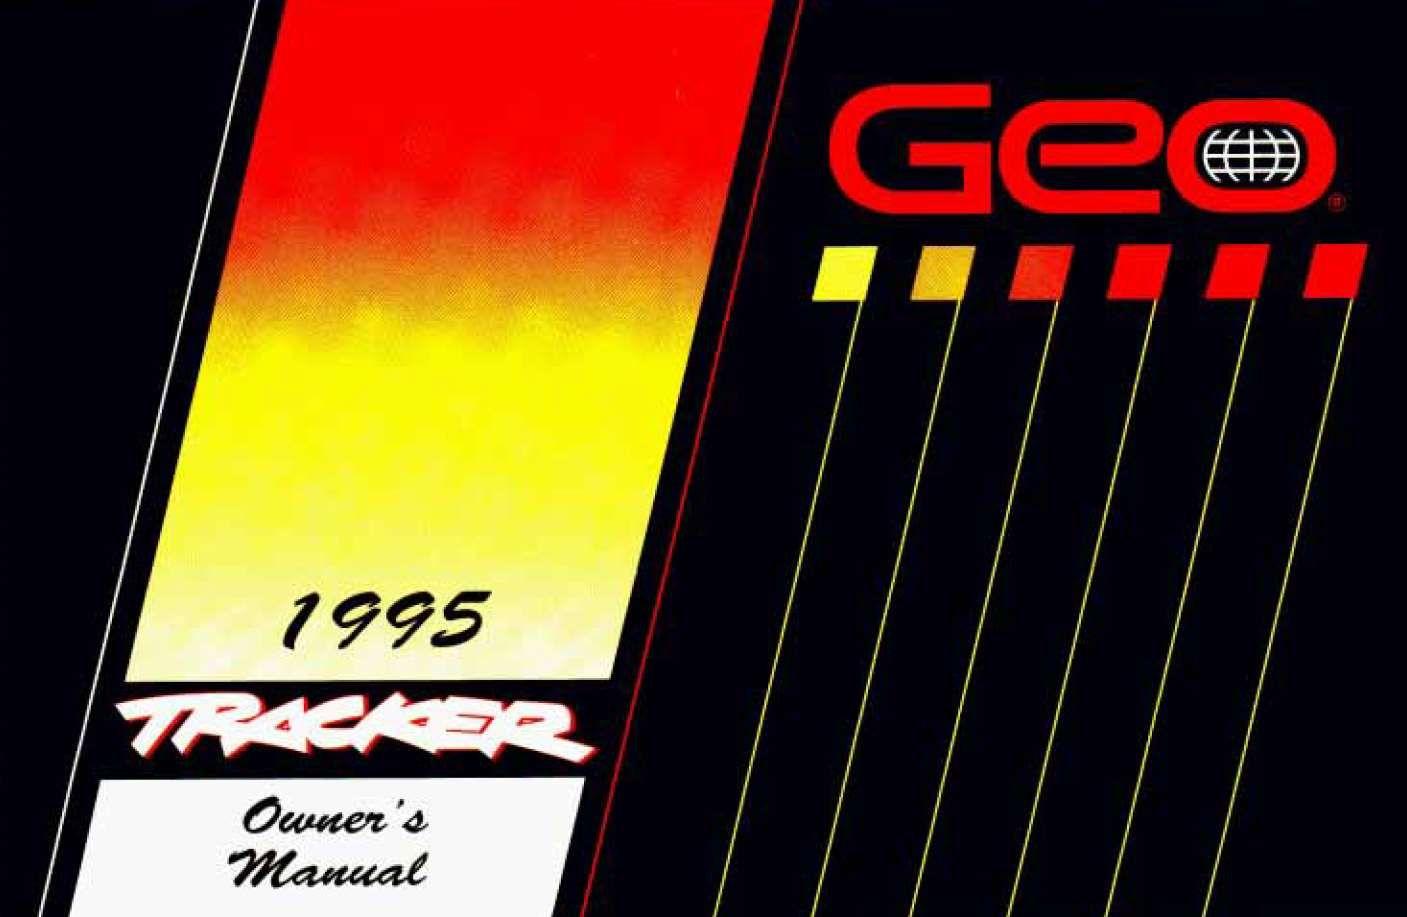 Chevrolet Tracker 1995 Owner S Manual Has Been Published On Procarmanuals Com Https Procarmanuals Com Chevrolet Tracke Owners Manuals Chevrolet Camaro Manual